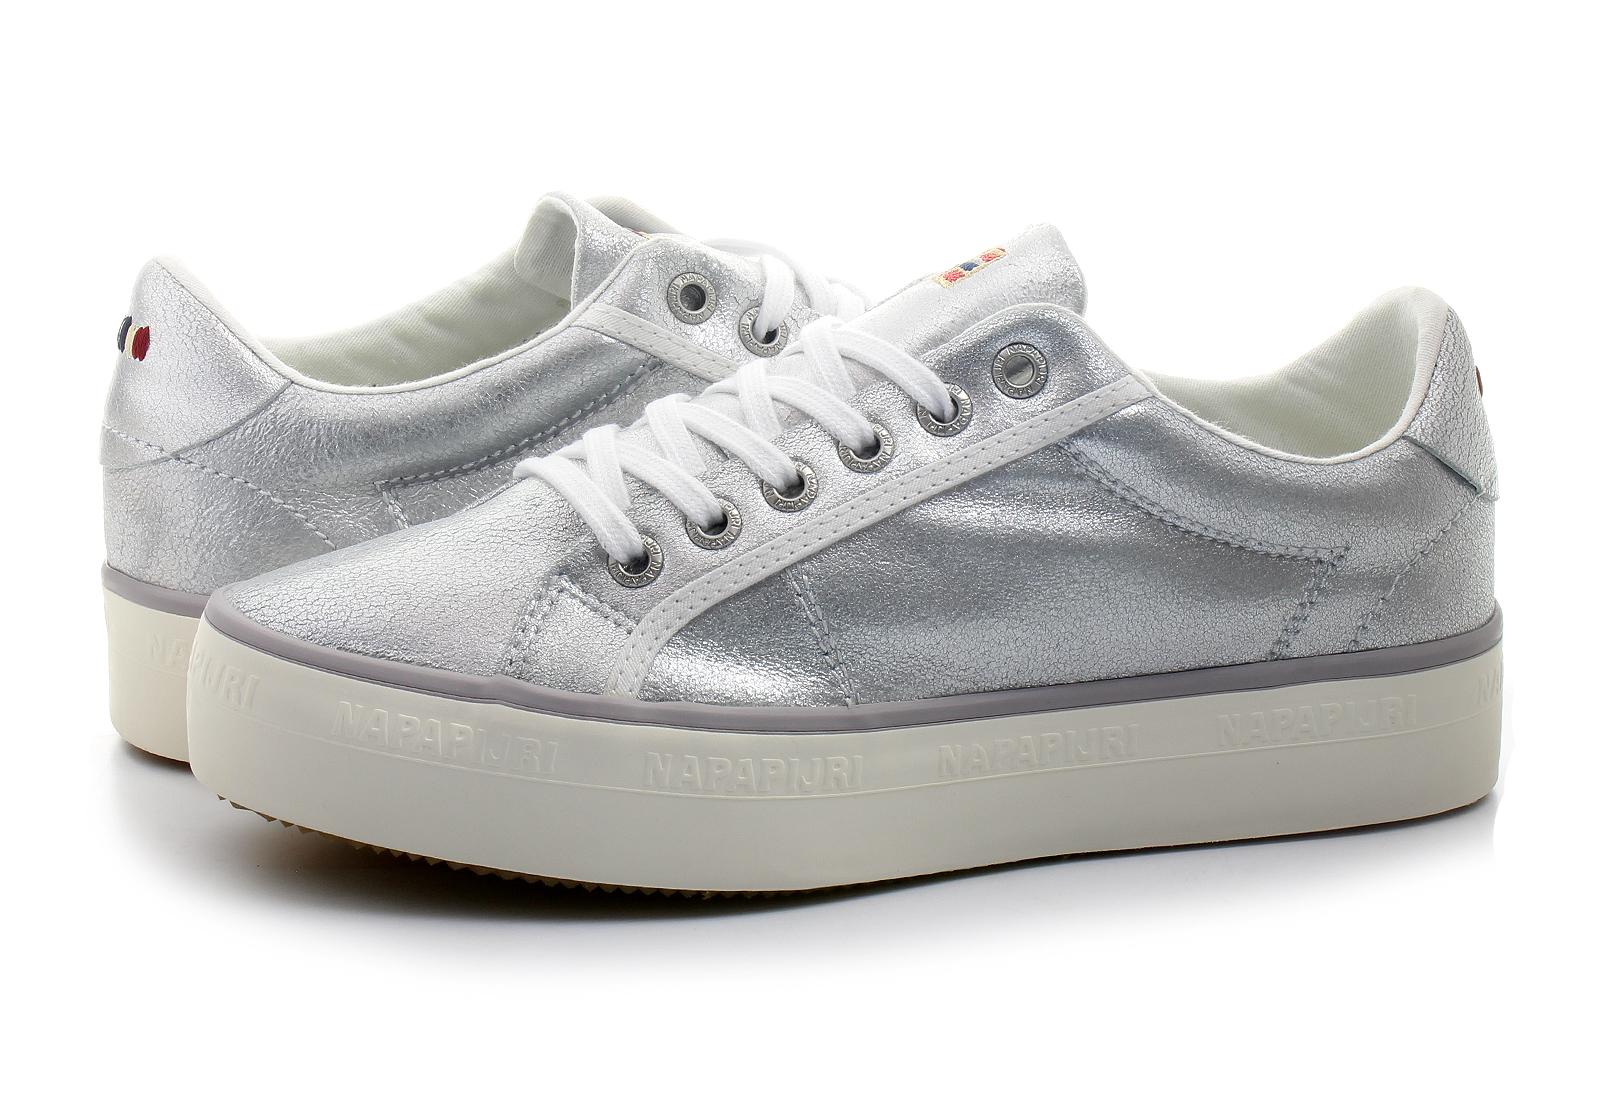 2249c529918086 Napapijri Shoes - Astrid - 14731783-N85 - Online shop for sneakers ...